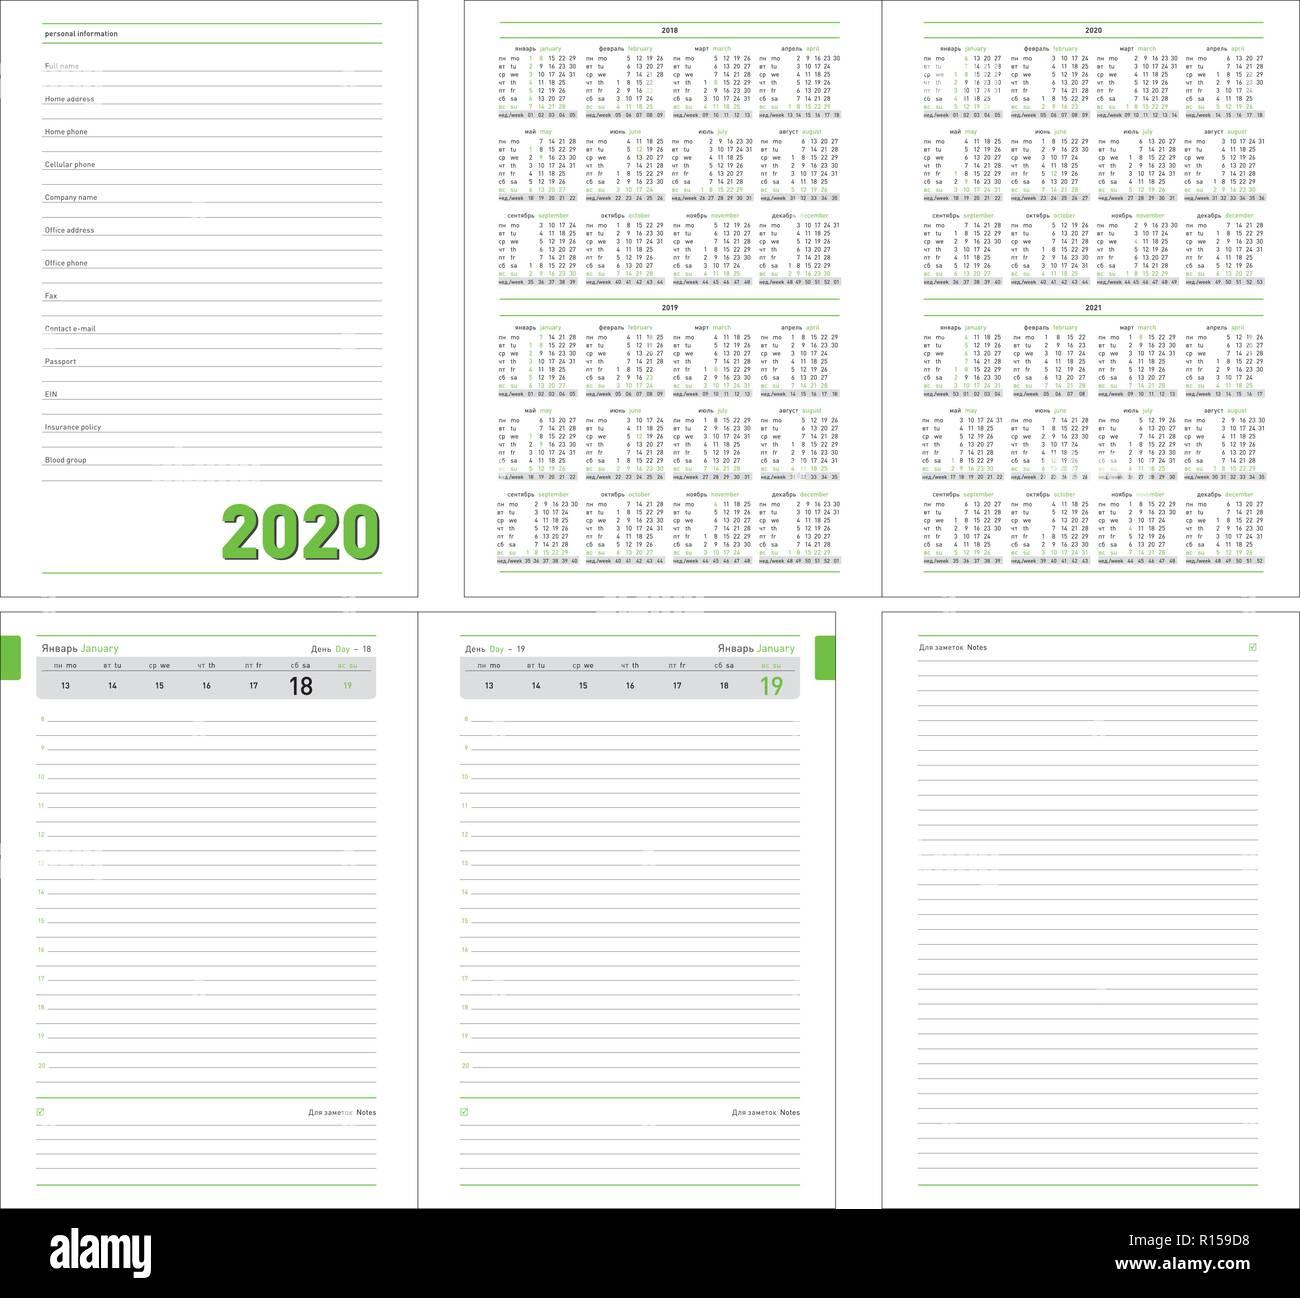 Calendrier 2020 Vectoriel Gratuit.Calendrier Annee 2020 Agenda 2020 Agenda Avec Calendrier